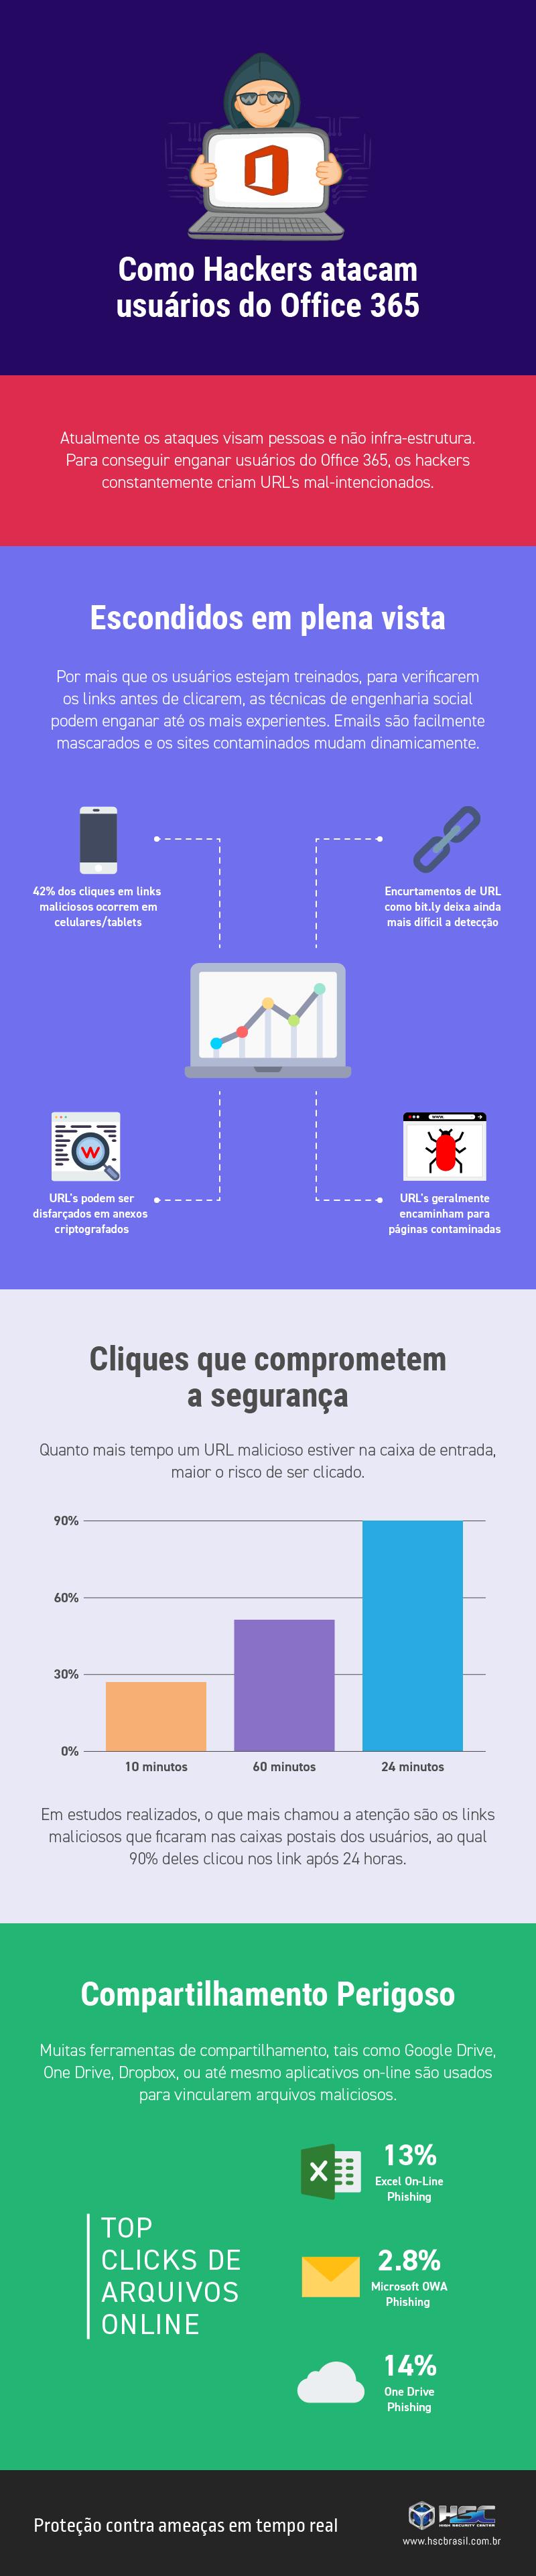 Infografico - Como os Hackers atacam